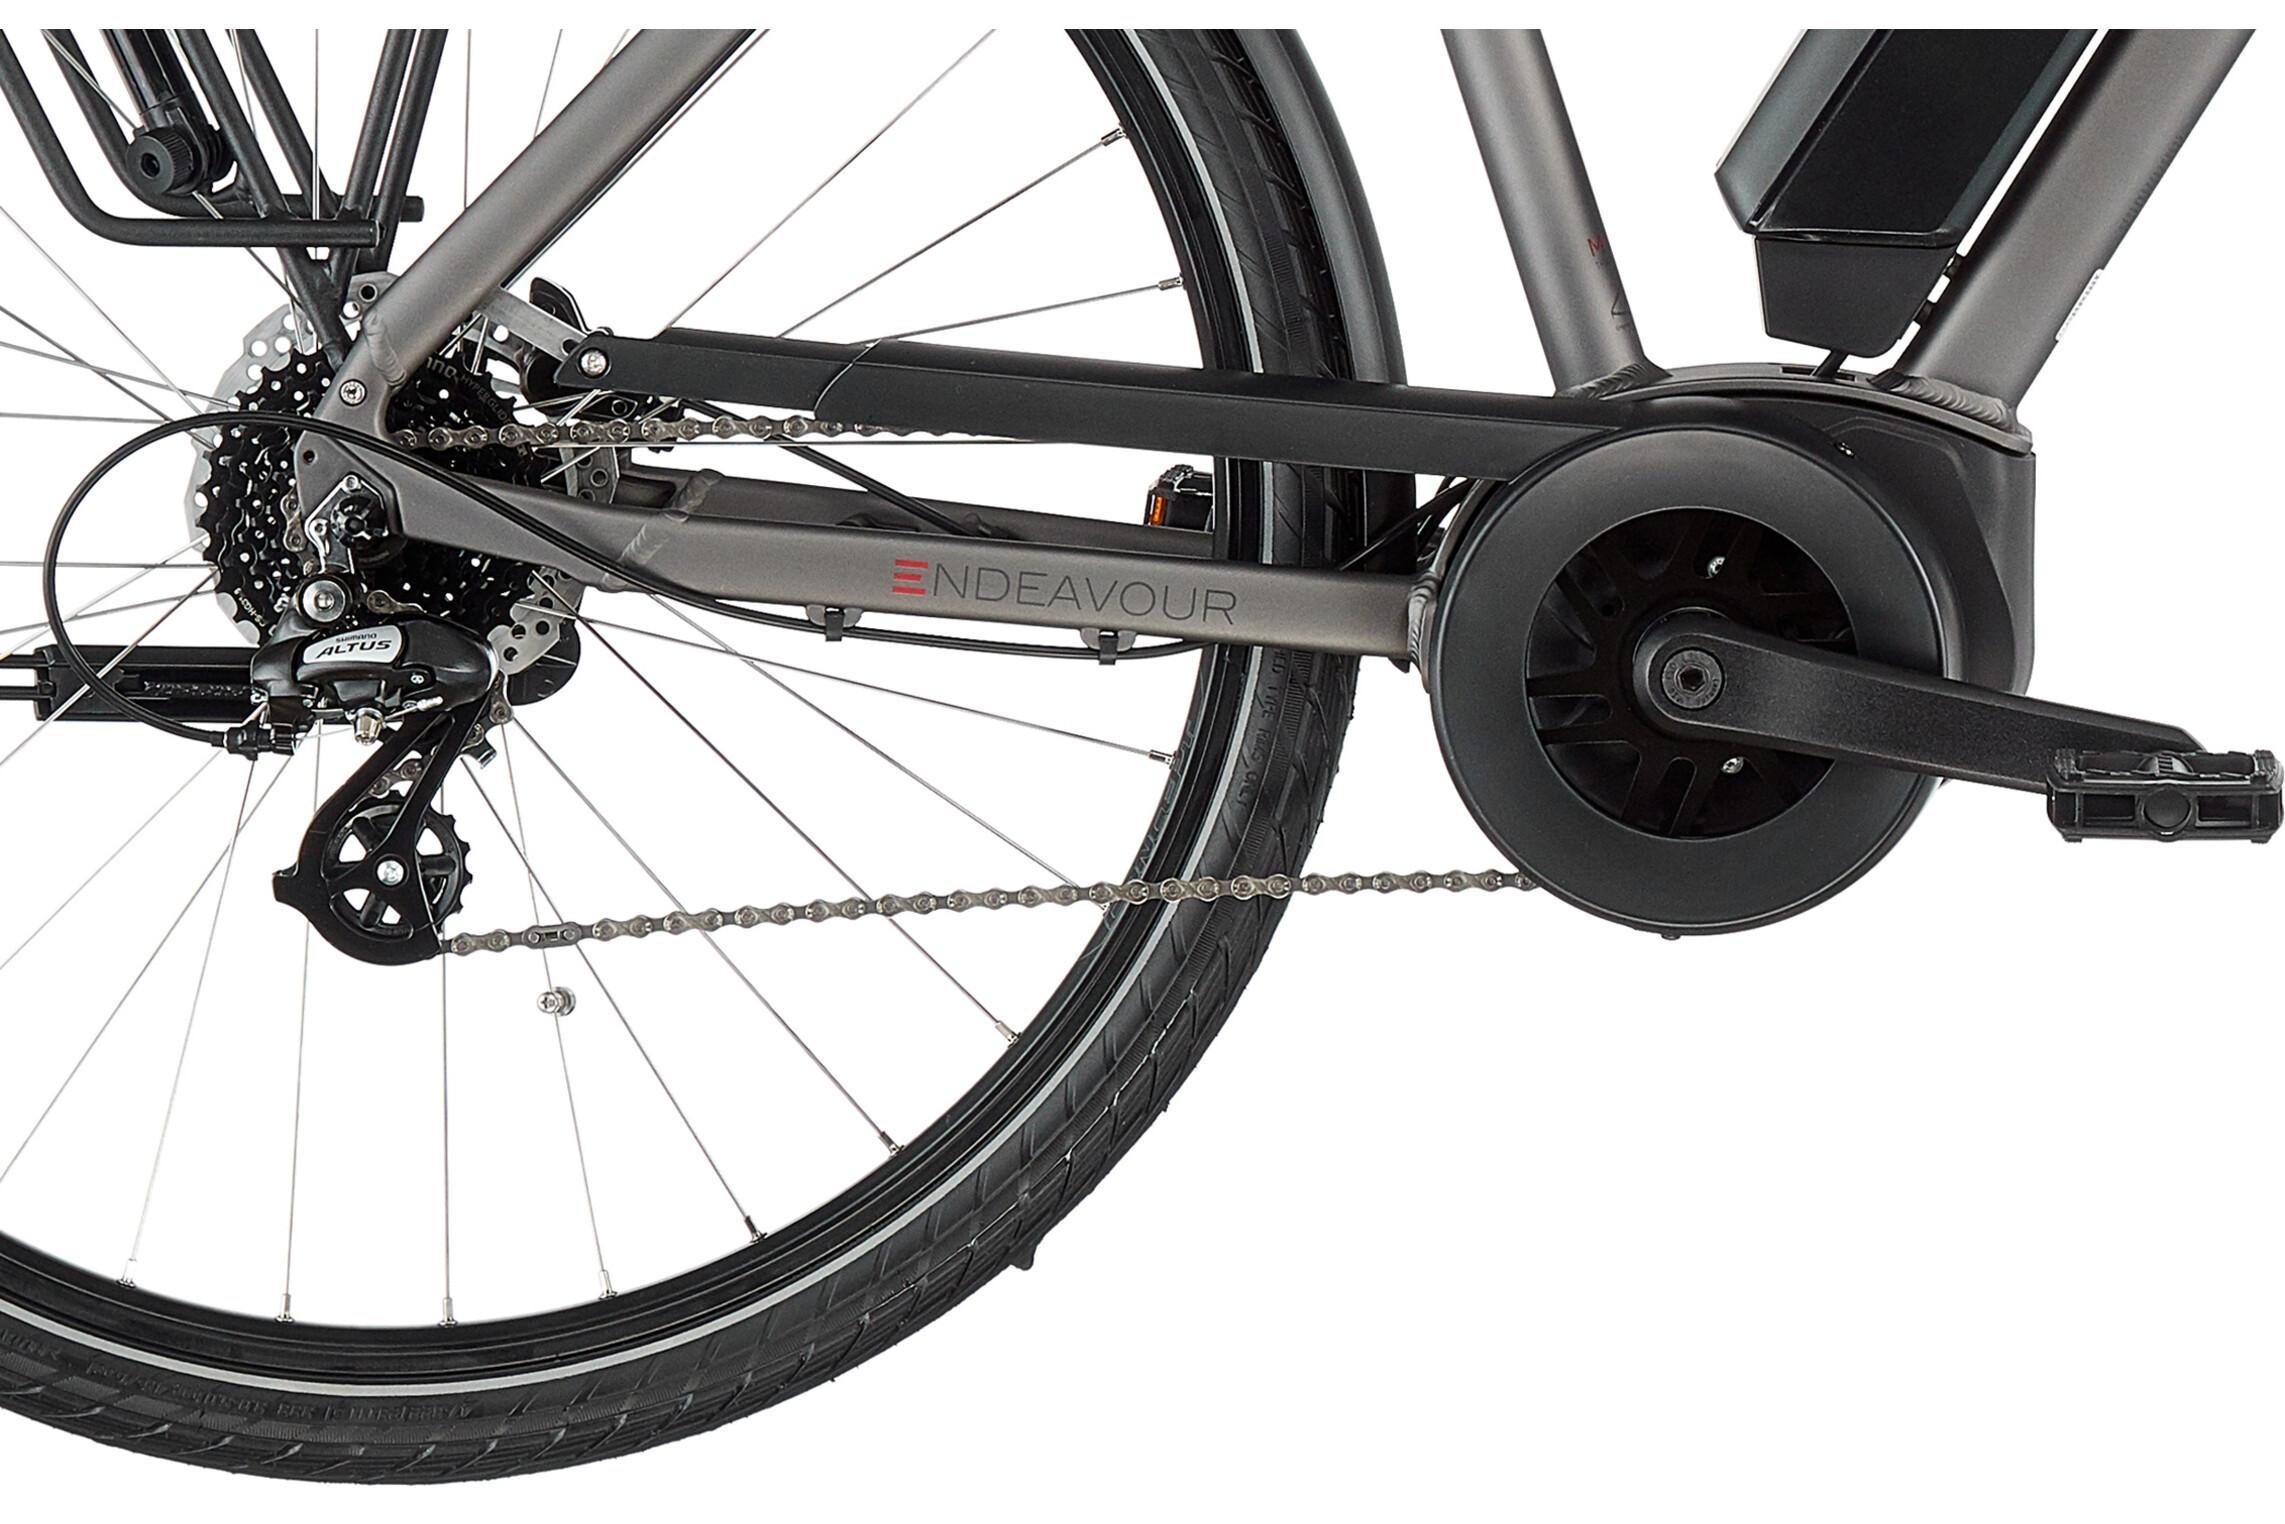 Kalkhoff Endeavour 1.B Move Trapeze Frame e-Bike